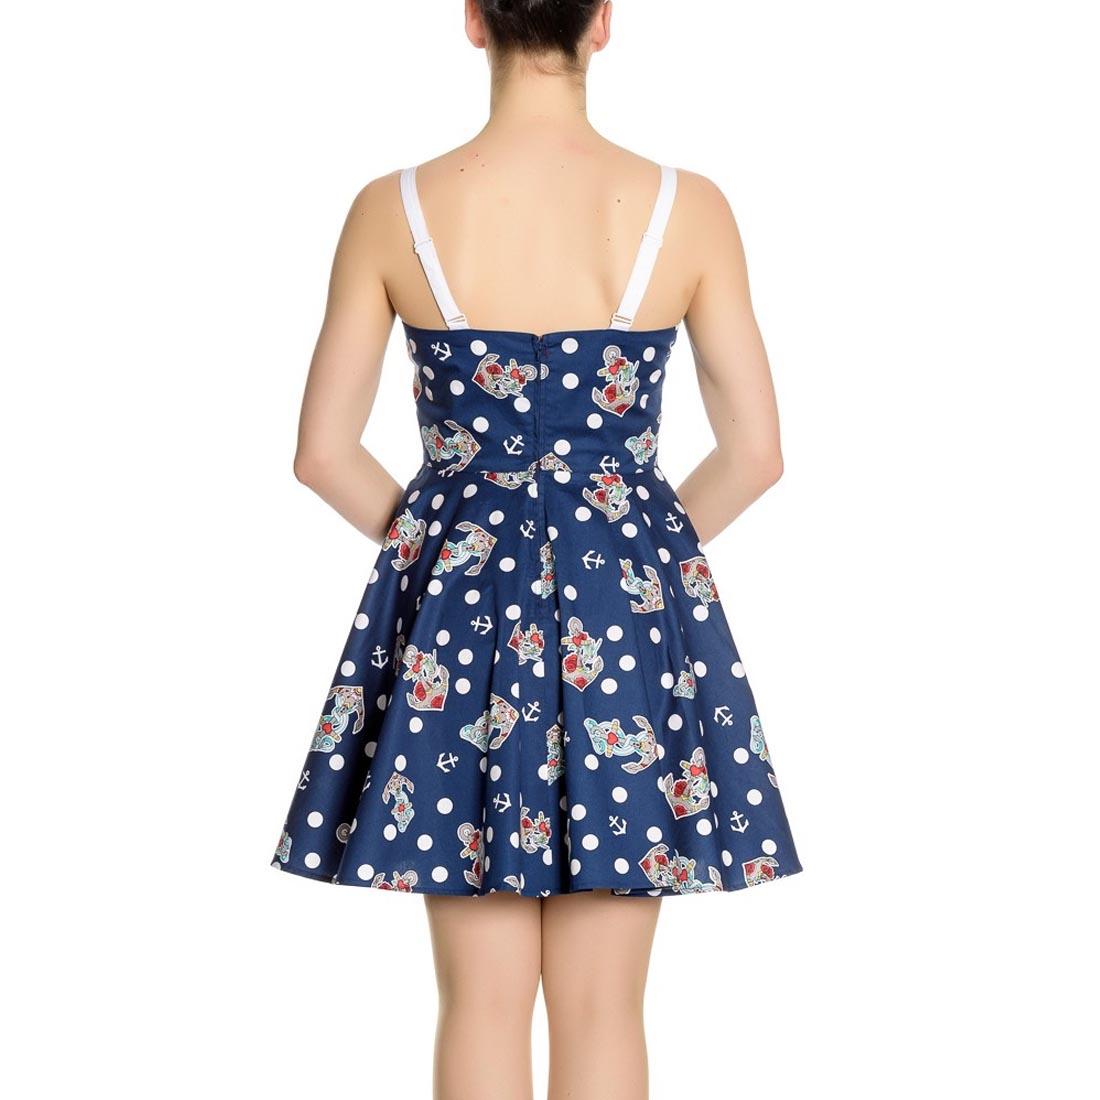 Hell-Bunny-Navy-Blue-50s-Nautical-Mini-Dress-OCEANA-Polka-Dot-All-Sizes thumbnail 21